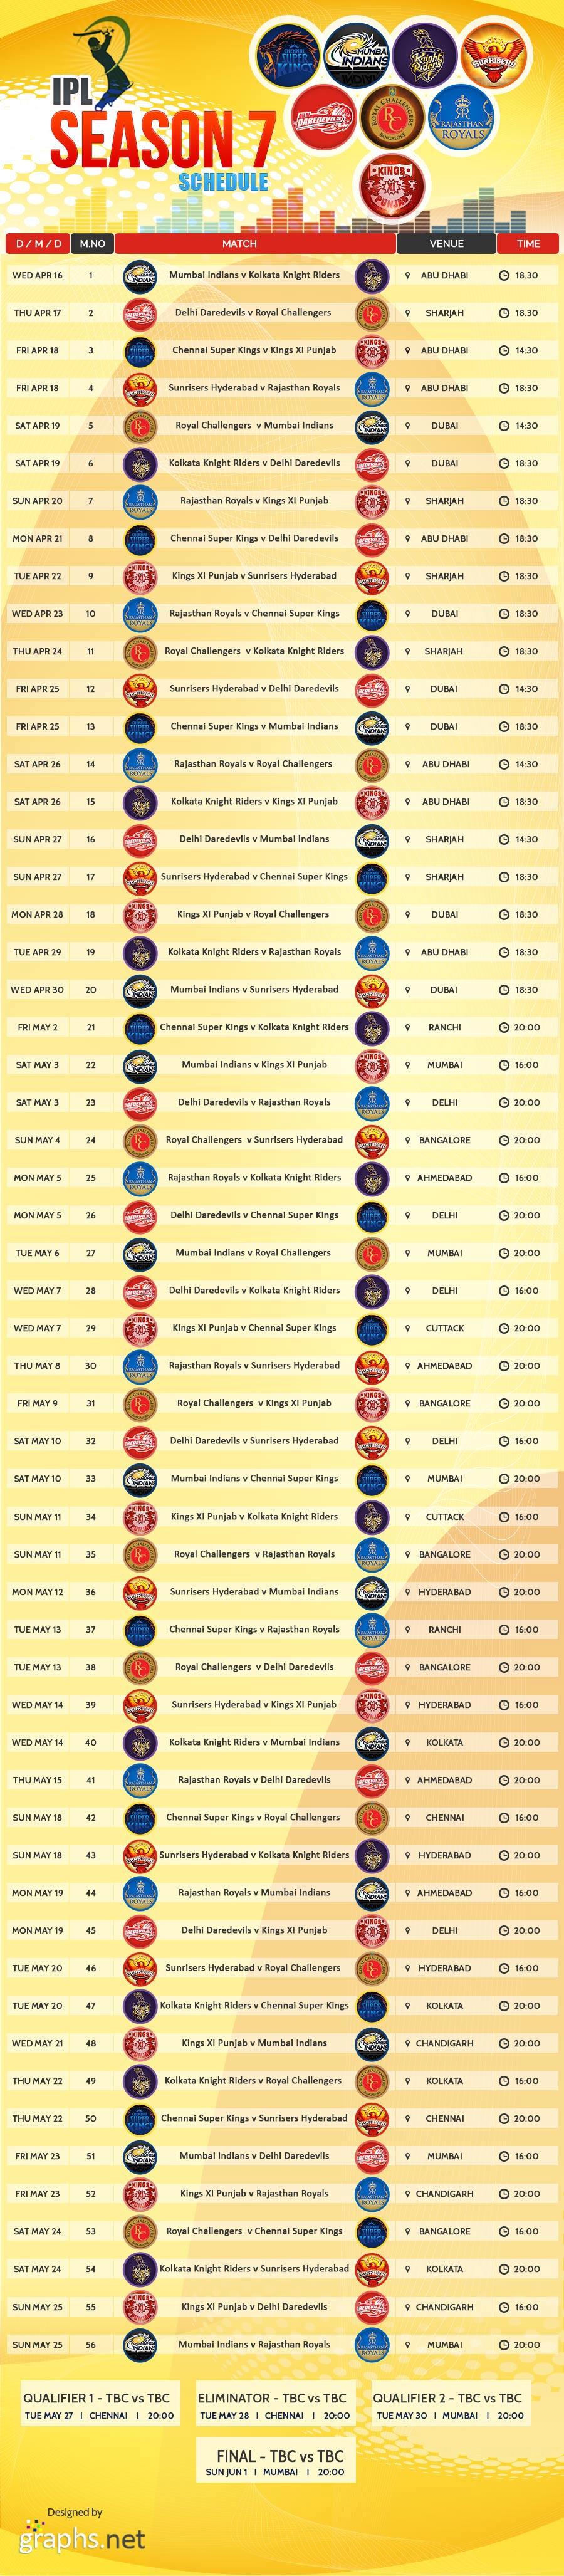 IPL-7-Schedule